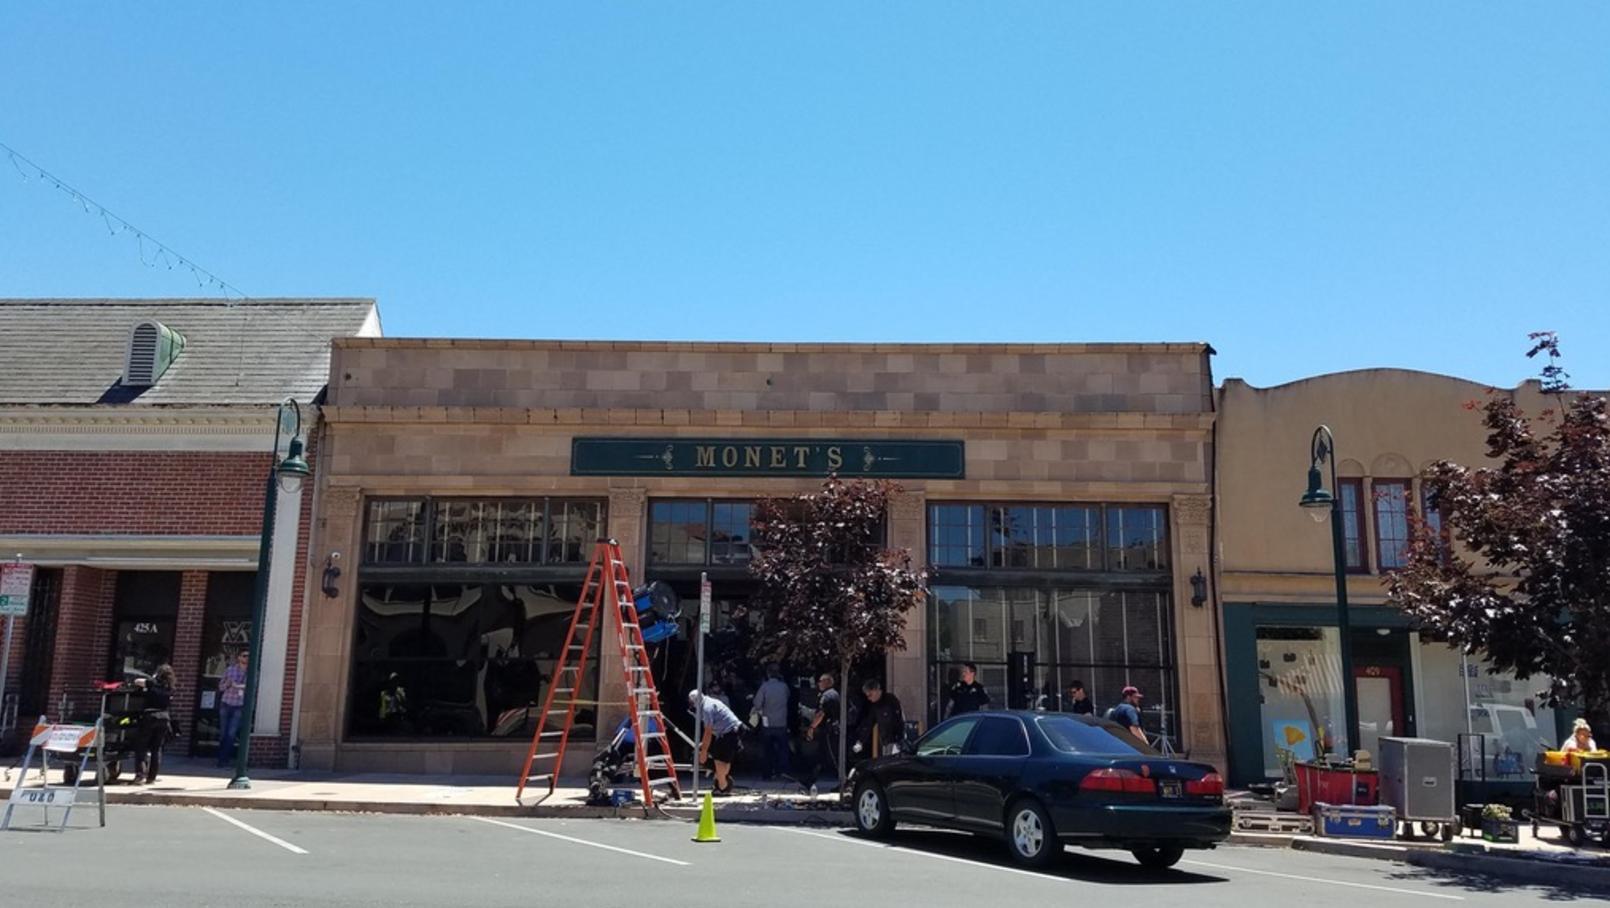 13 Reasons Why Season 2 Filming Monet's